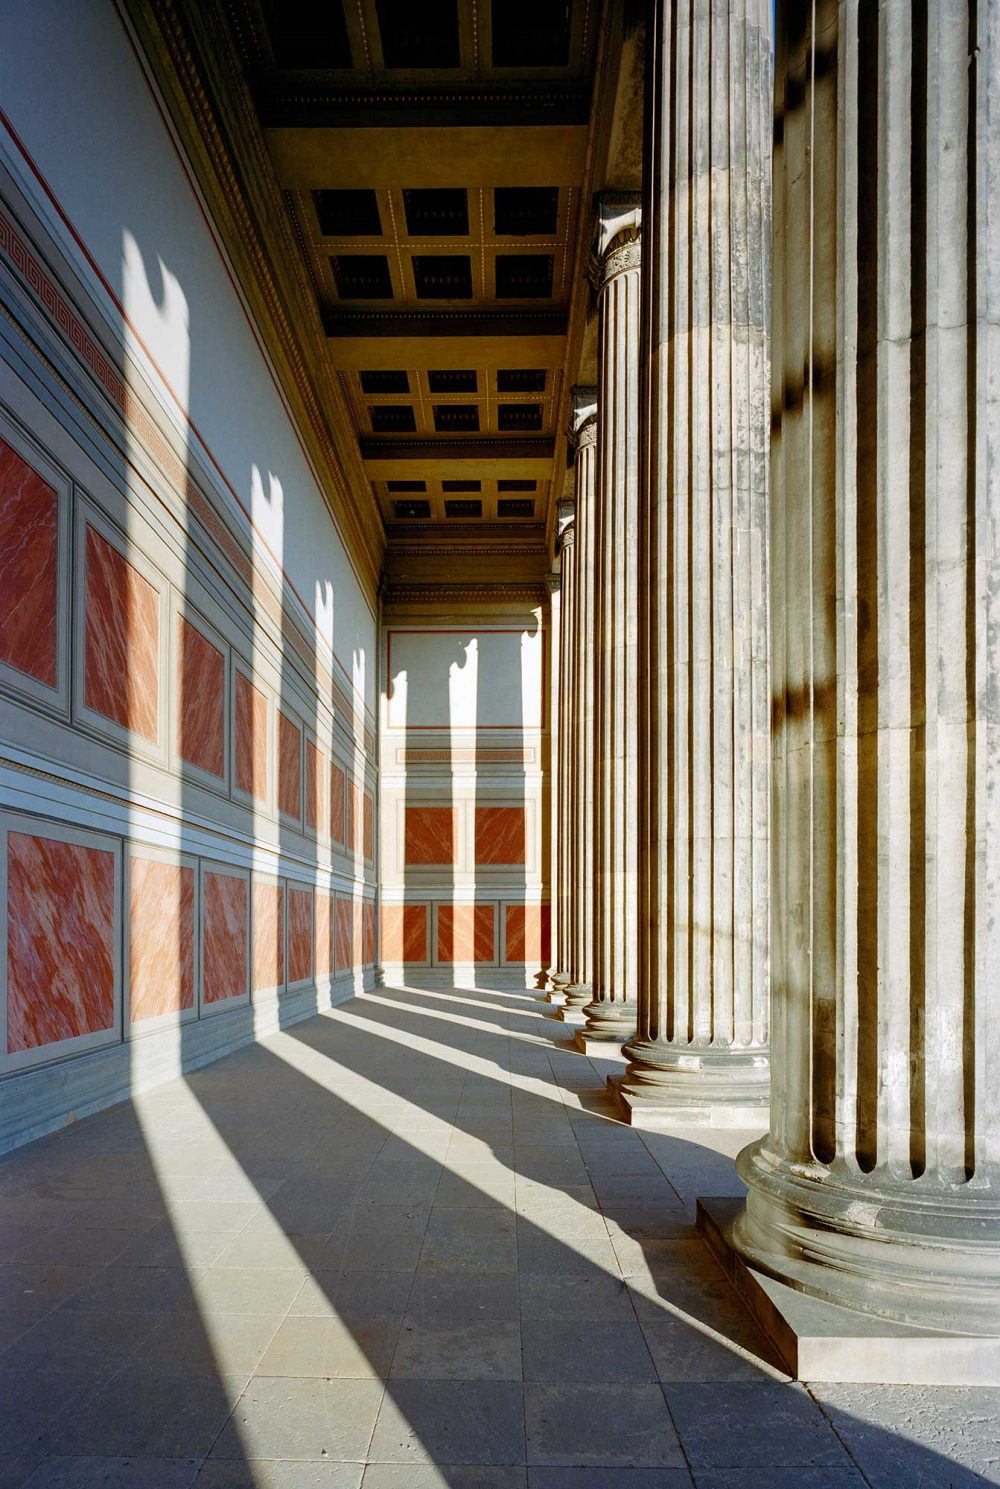 Säulenhalle des Alten Museums